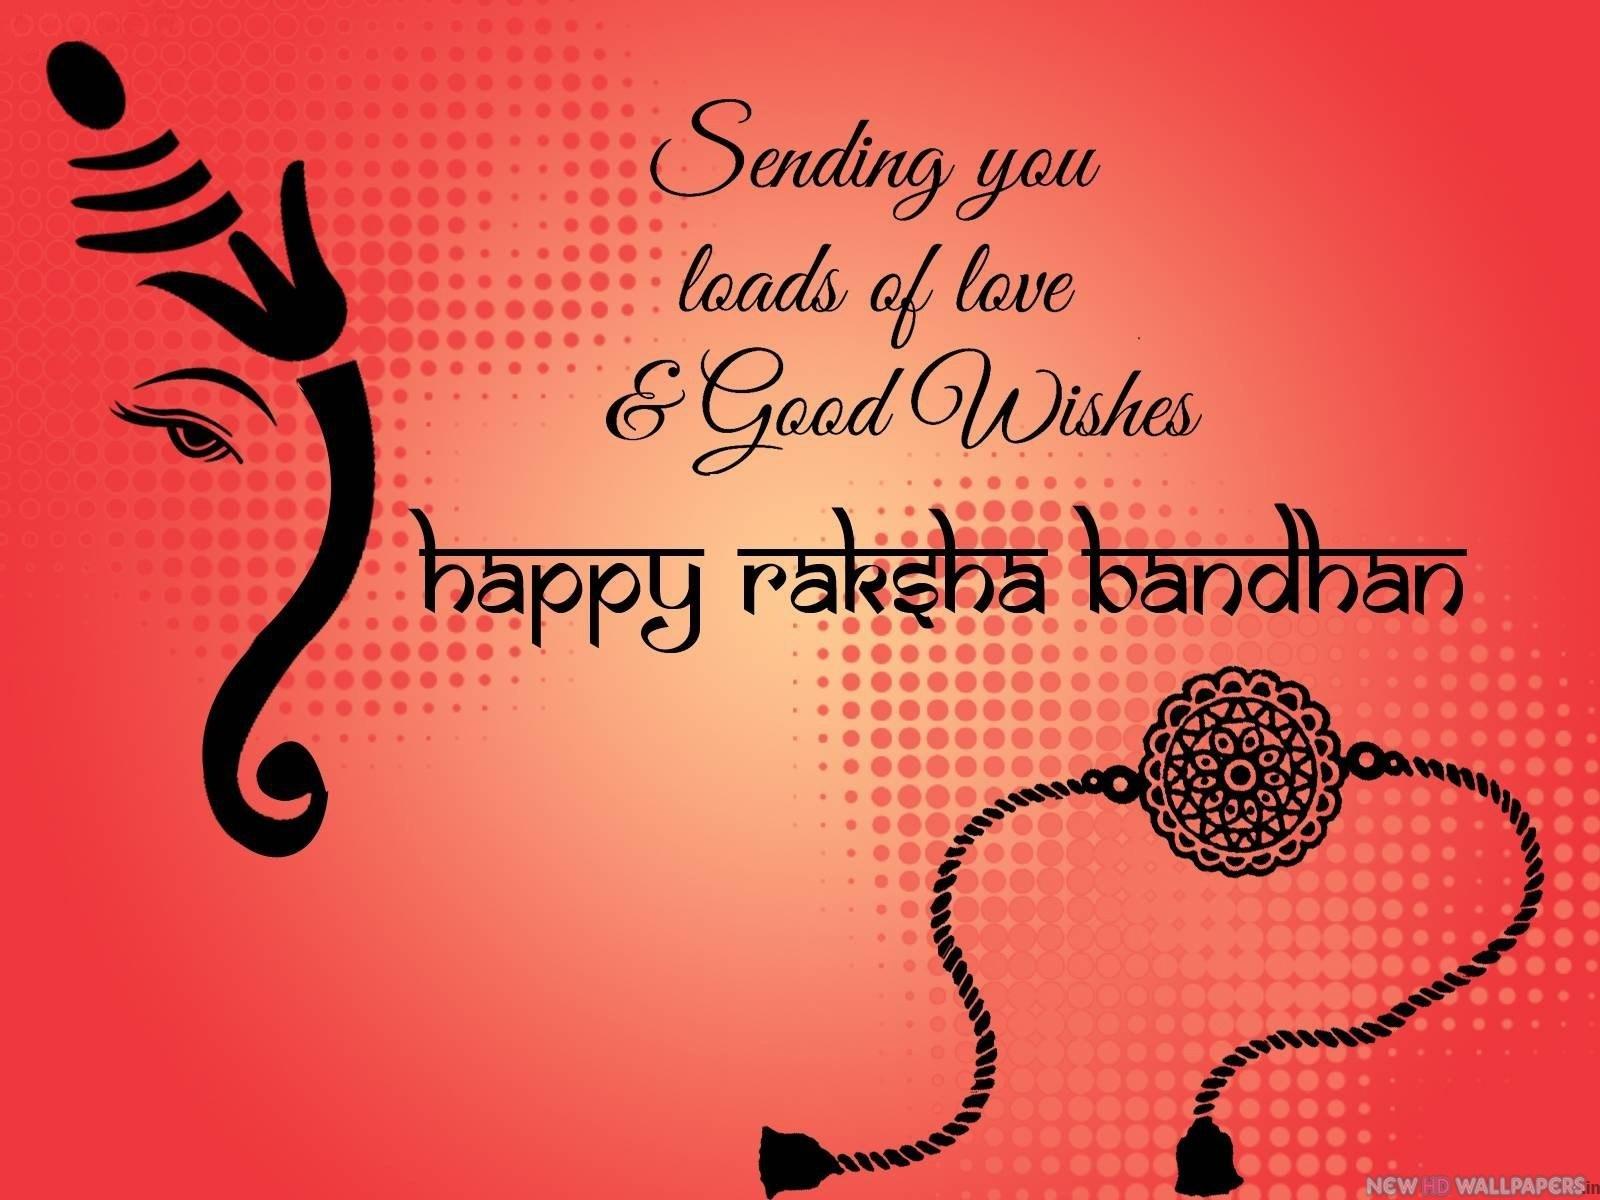 Essay For Kids On Raksha Bandhan In Hindi  Essay On Raksha Bandhan      Essay For Kids On Raksha Bandhan In Hindi Synthesis Essay also Business Essay Format  Thesis Of An Essay